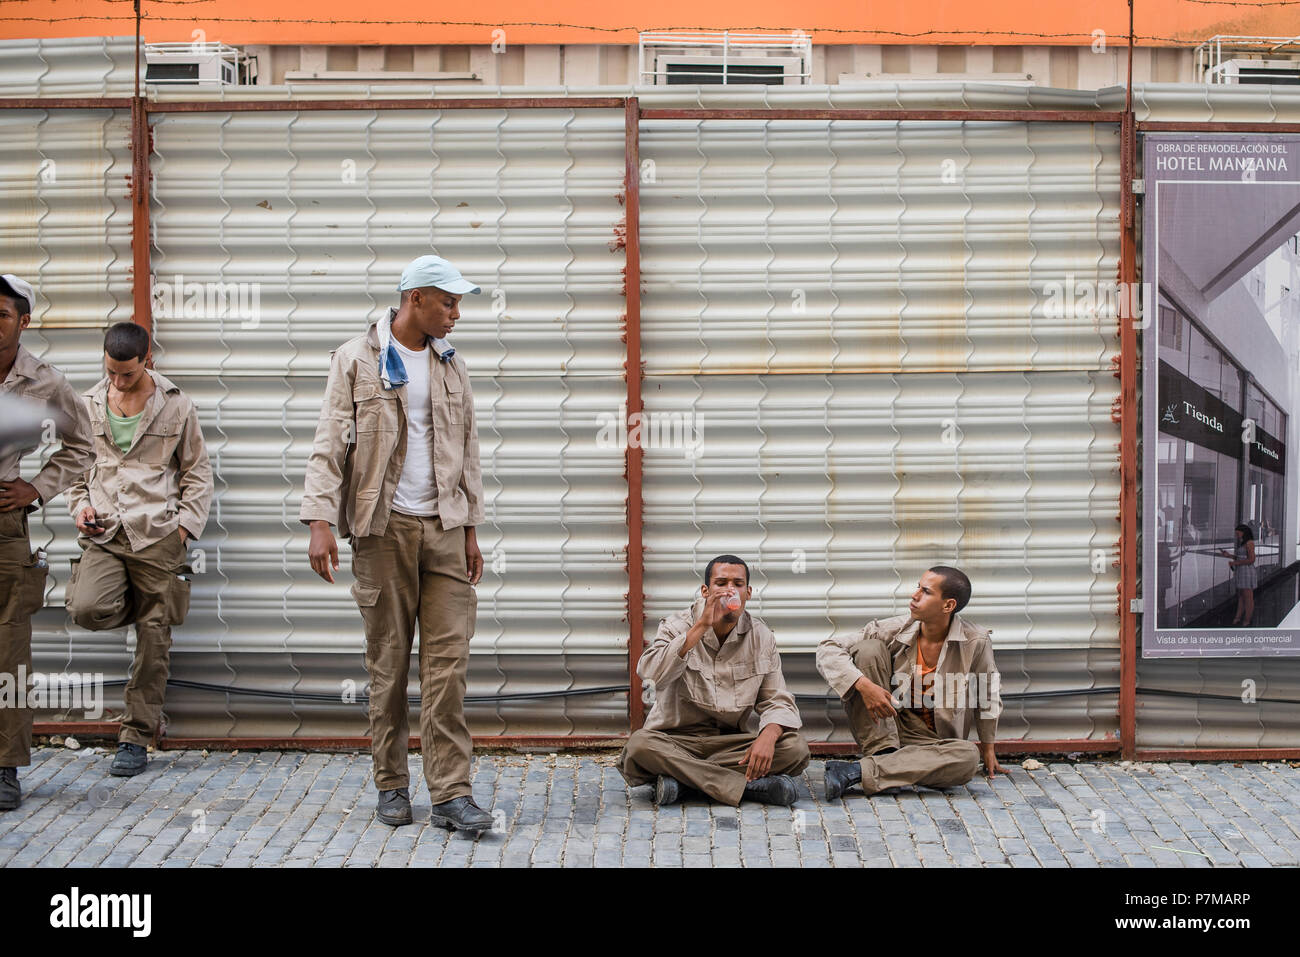 Construction workers take a break on a hot day in Havana, Cuba. - Stock Image